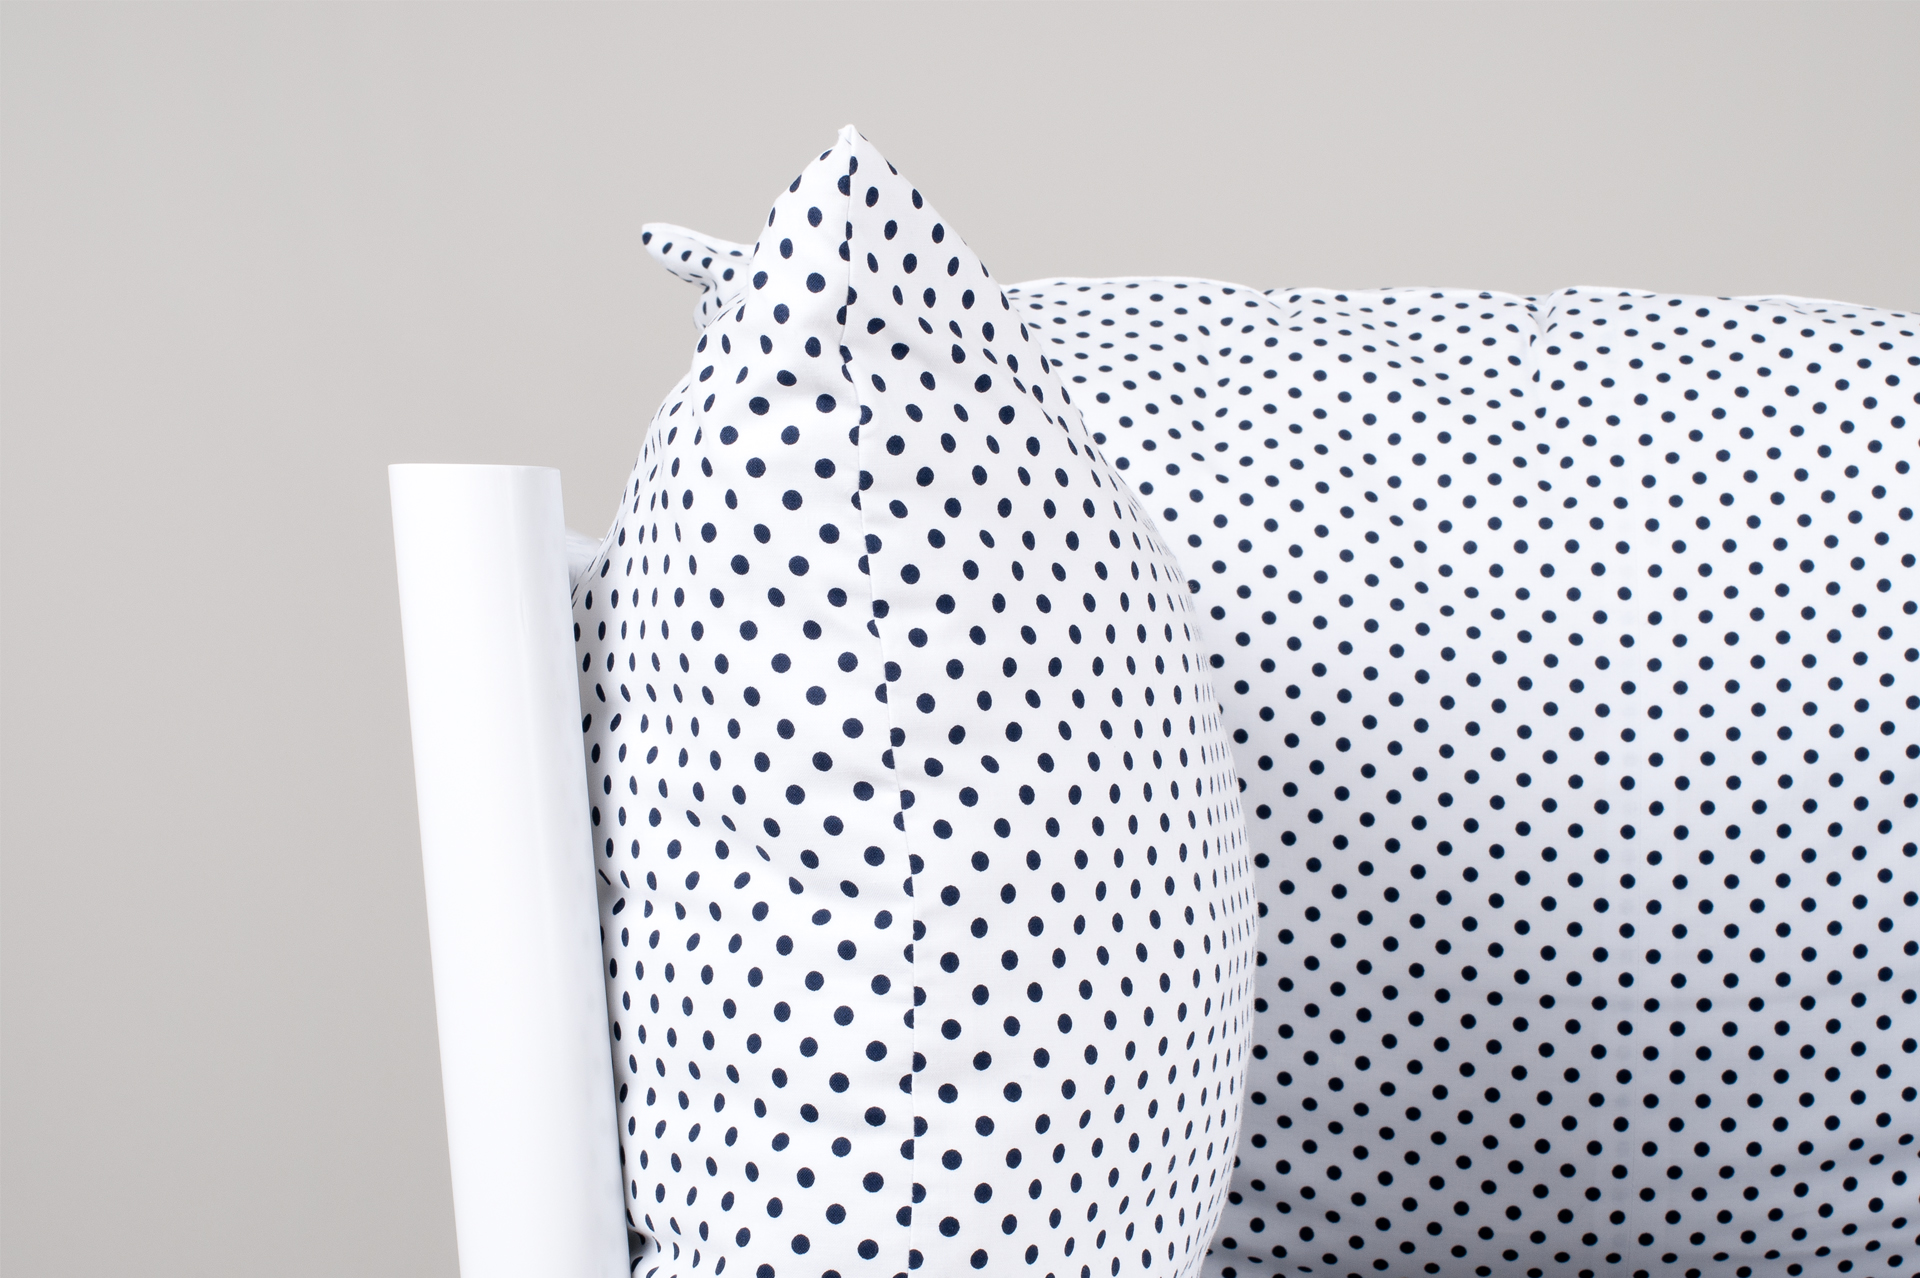 armchair, armchair design, traditional design, slovak design, culture, object design, kreslo, dizajn kresla, sedenie, dots design, bodky, culture, veronika paluchova, product designer, produkt, dizajner,